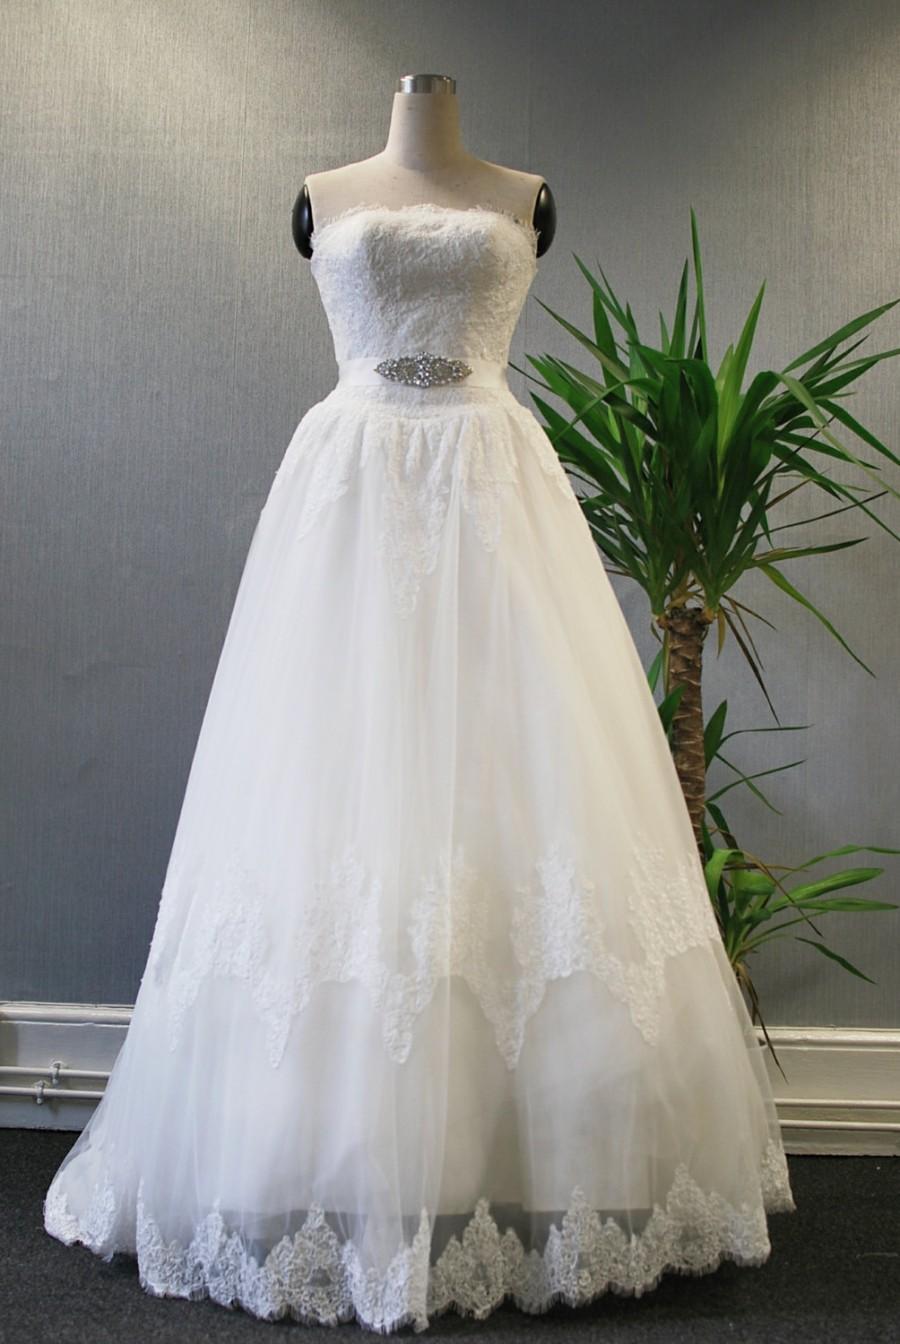 Mariage - Alençon lace strapless wedding dress